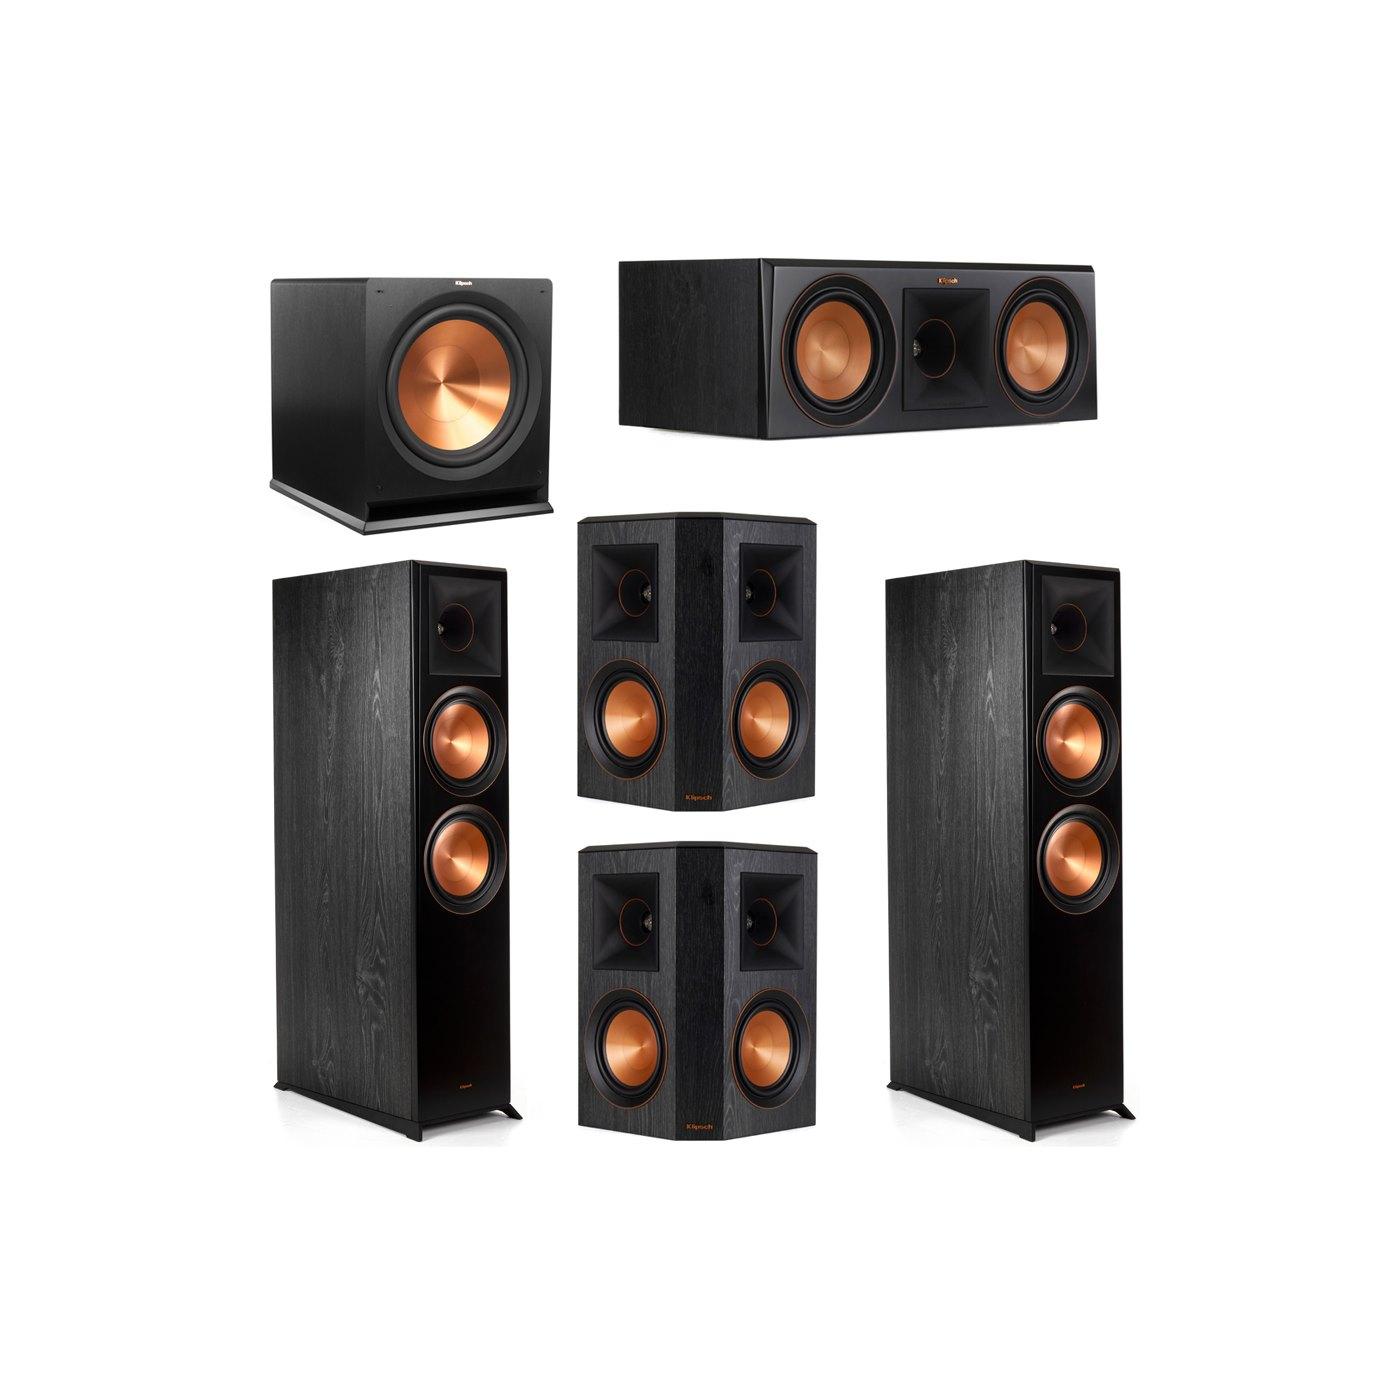 Klipsch 5.1 System with 2 RP-8000F Floorstanding Speakers, 1 Klipsch RP-600C Center Speaker, 2 Klipsch RP-502S Surround Speakers, 1 Klipsch R-115SW Subwoofer